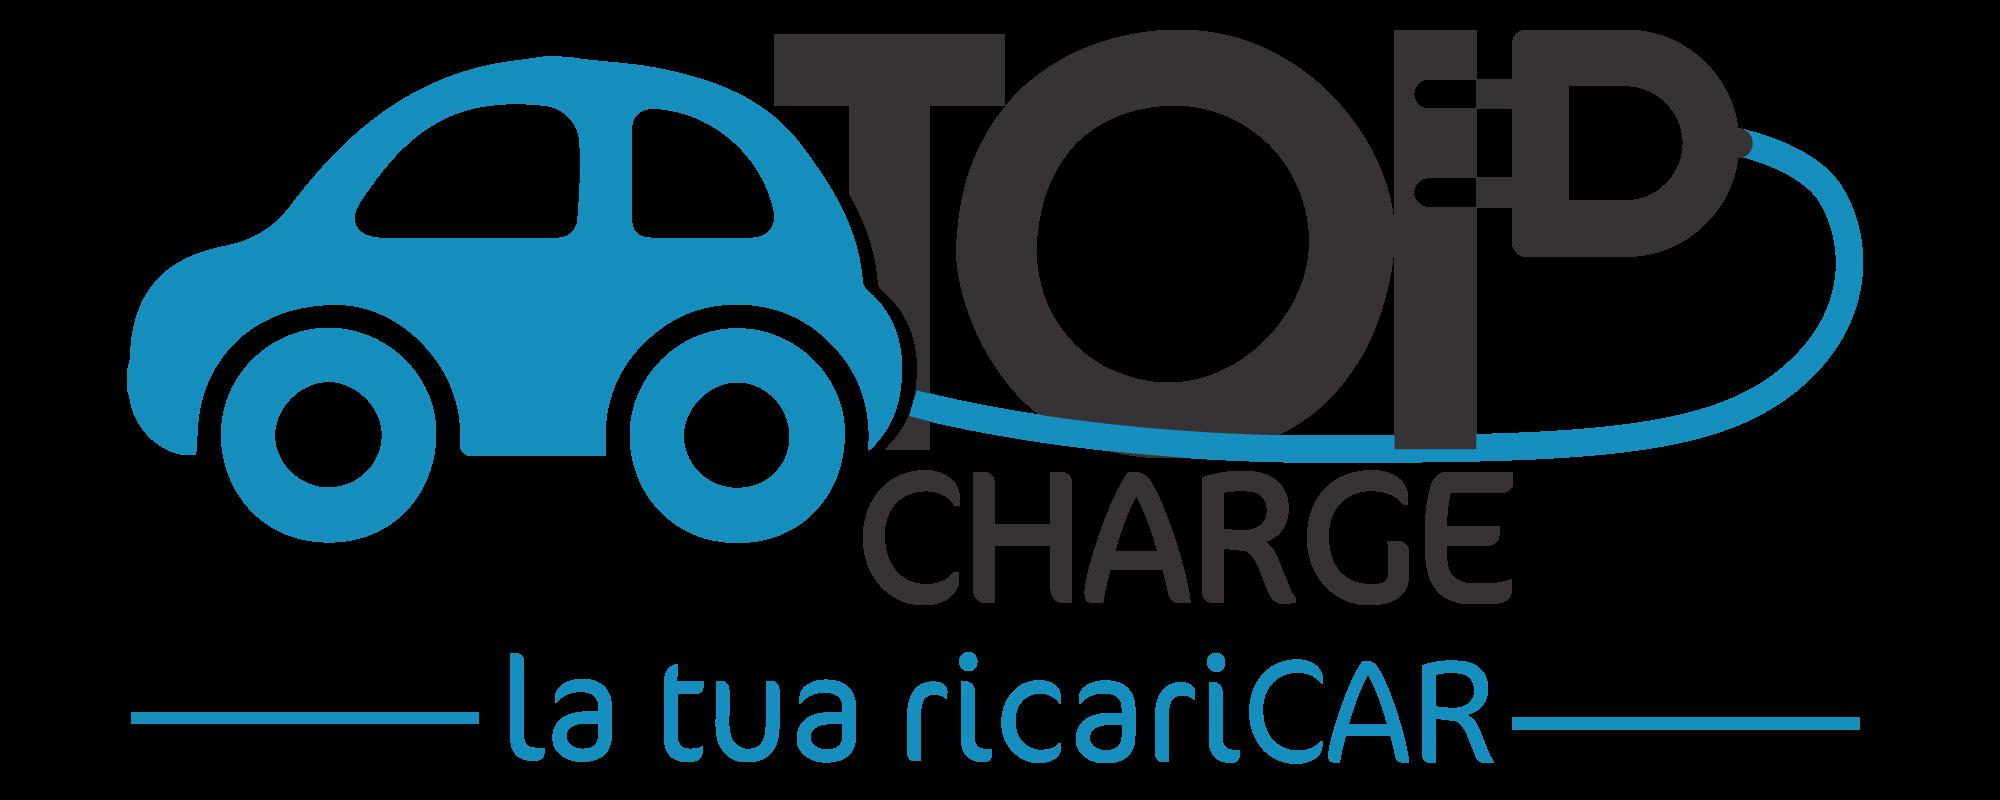 www.topcharge.it/